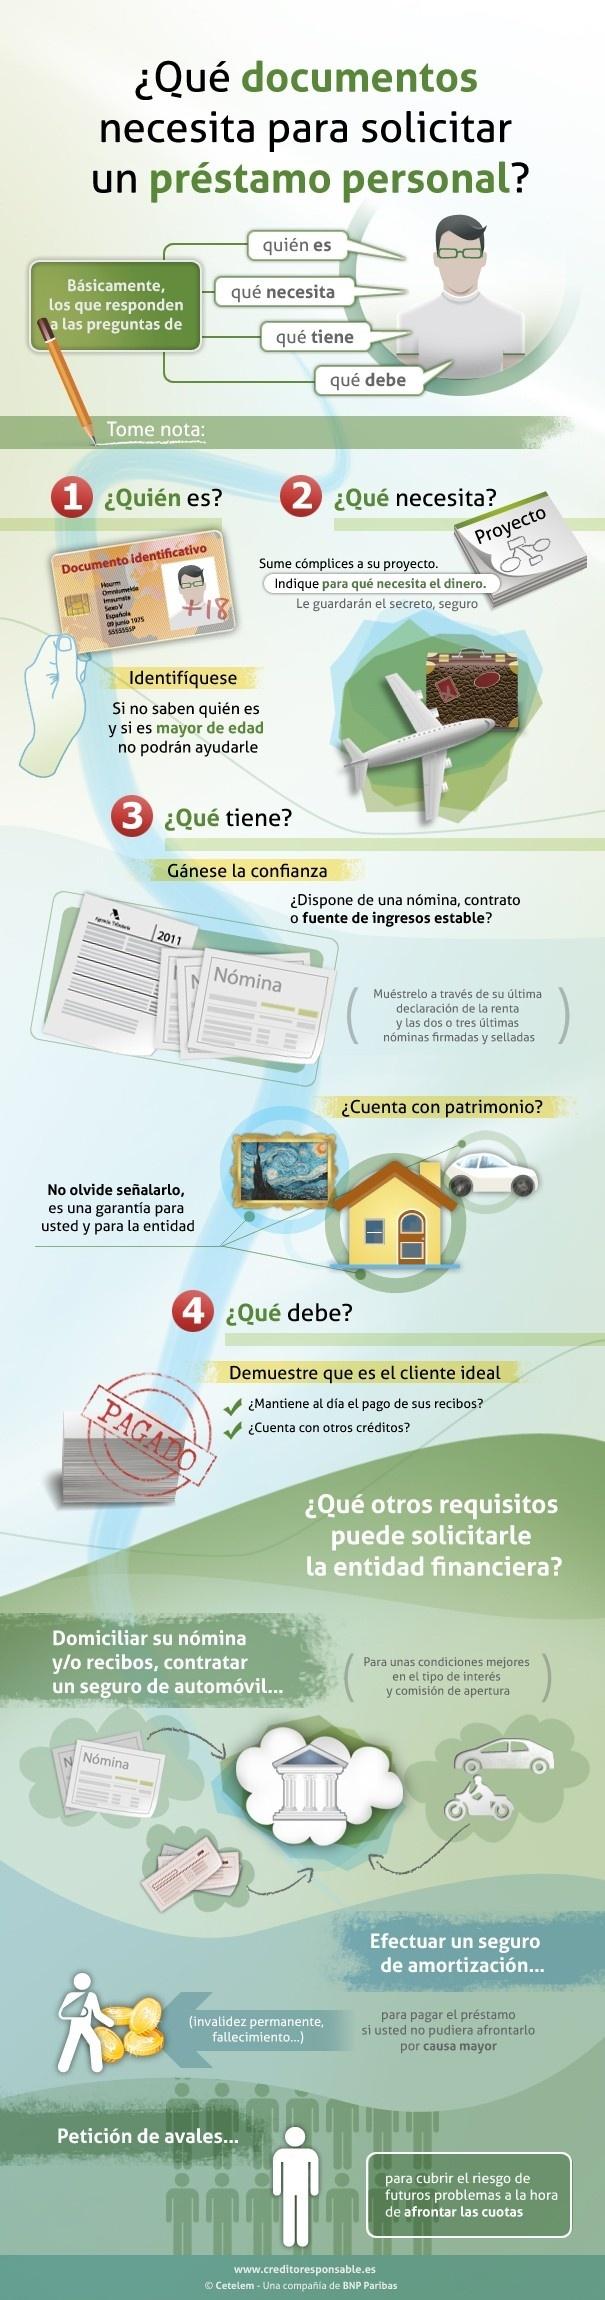 Documentos para solicitar un préstamo personal